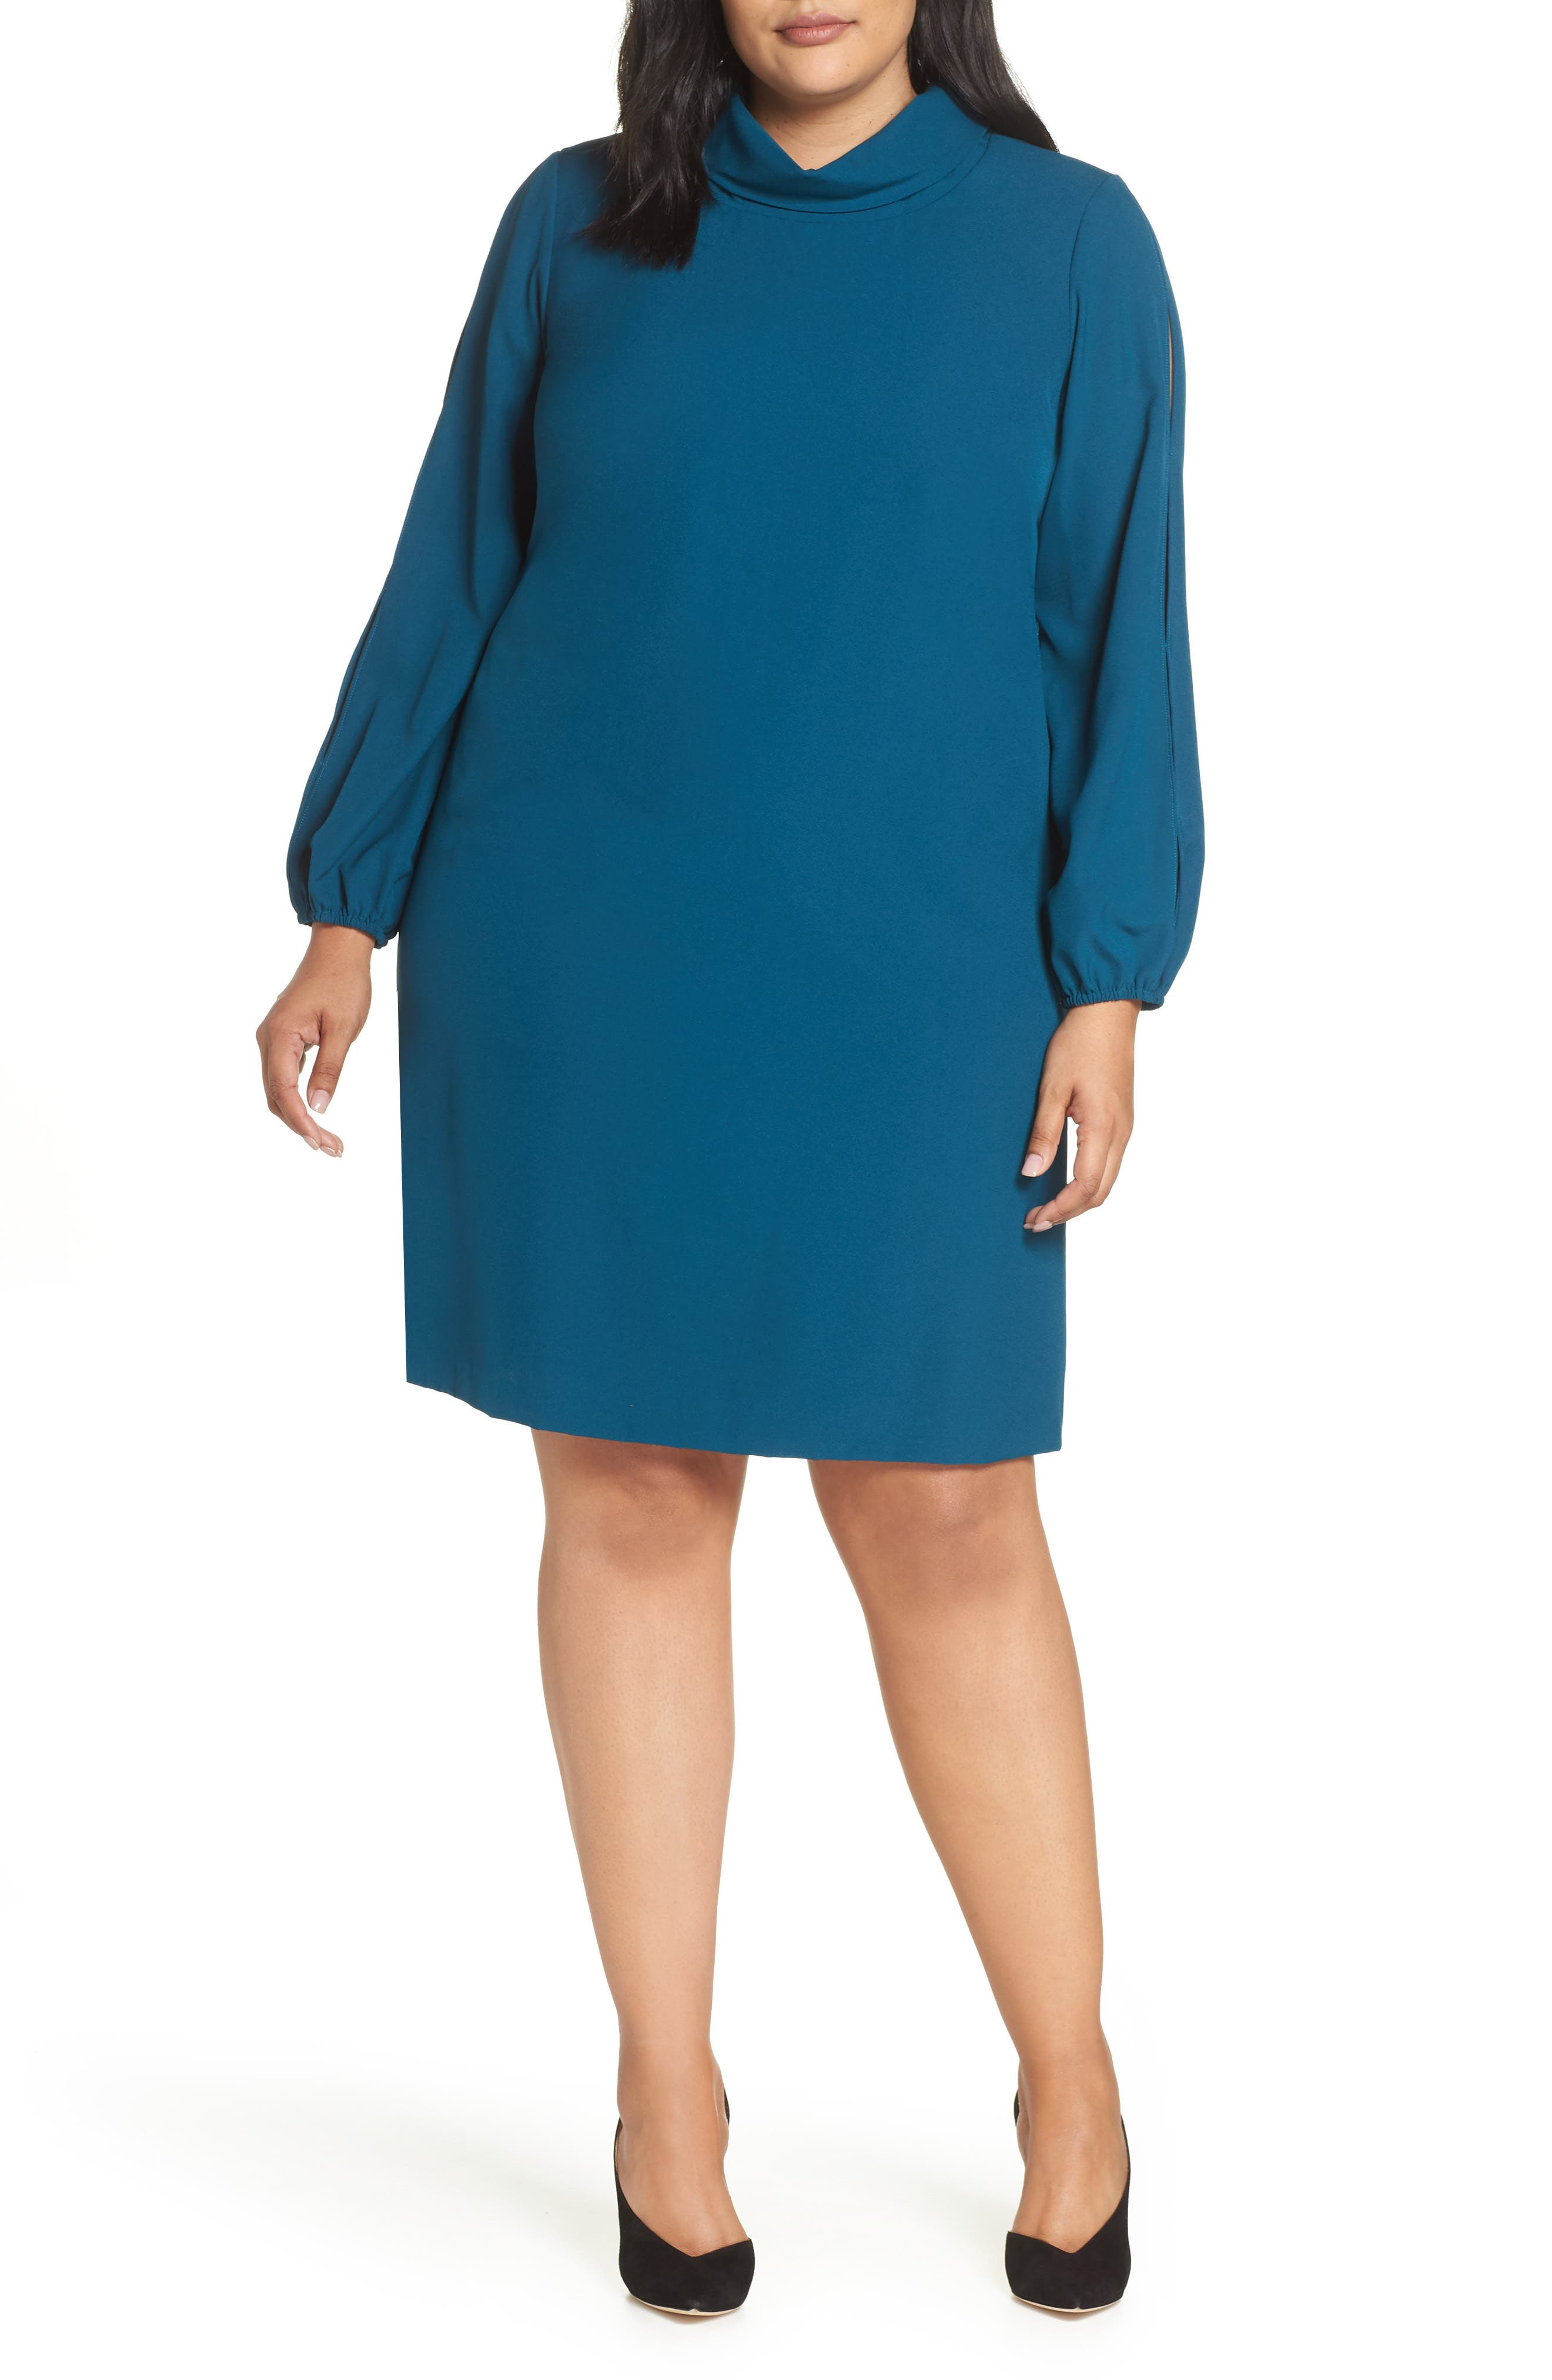 Tahari Plus Size Dresses